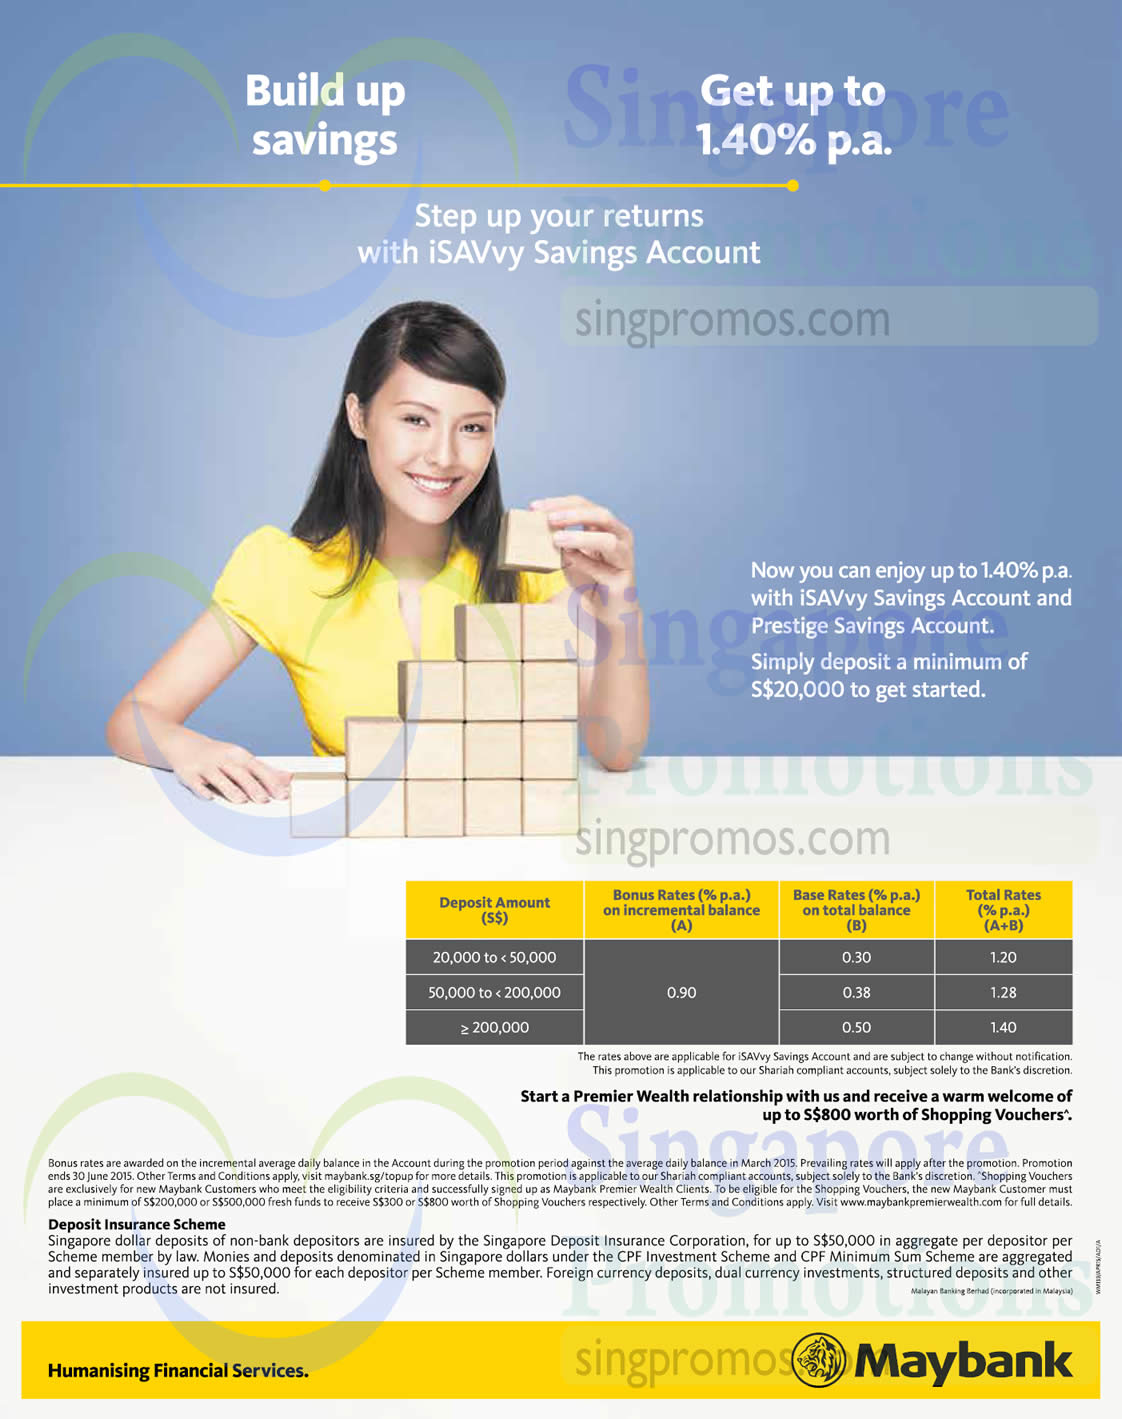 8 Apr Interest Rates on Deposits